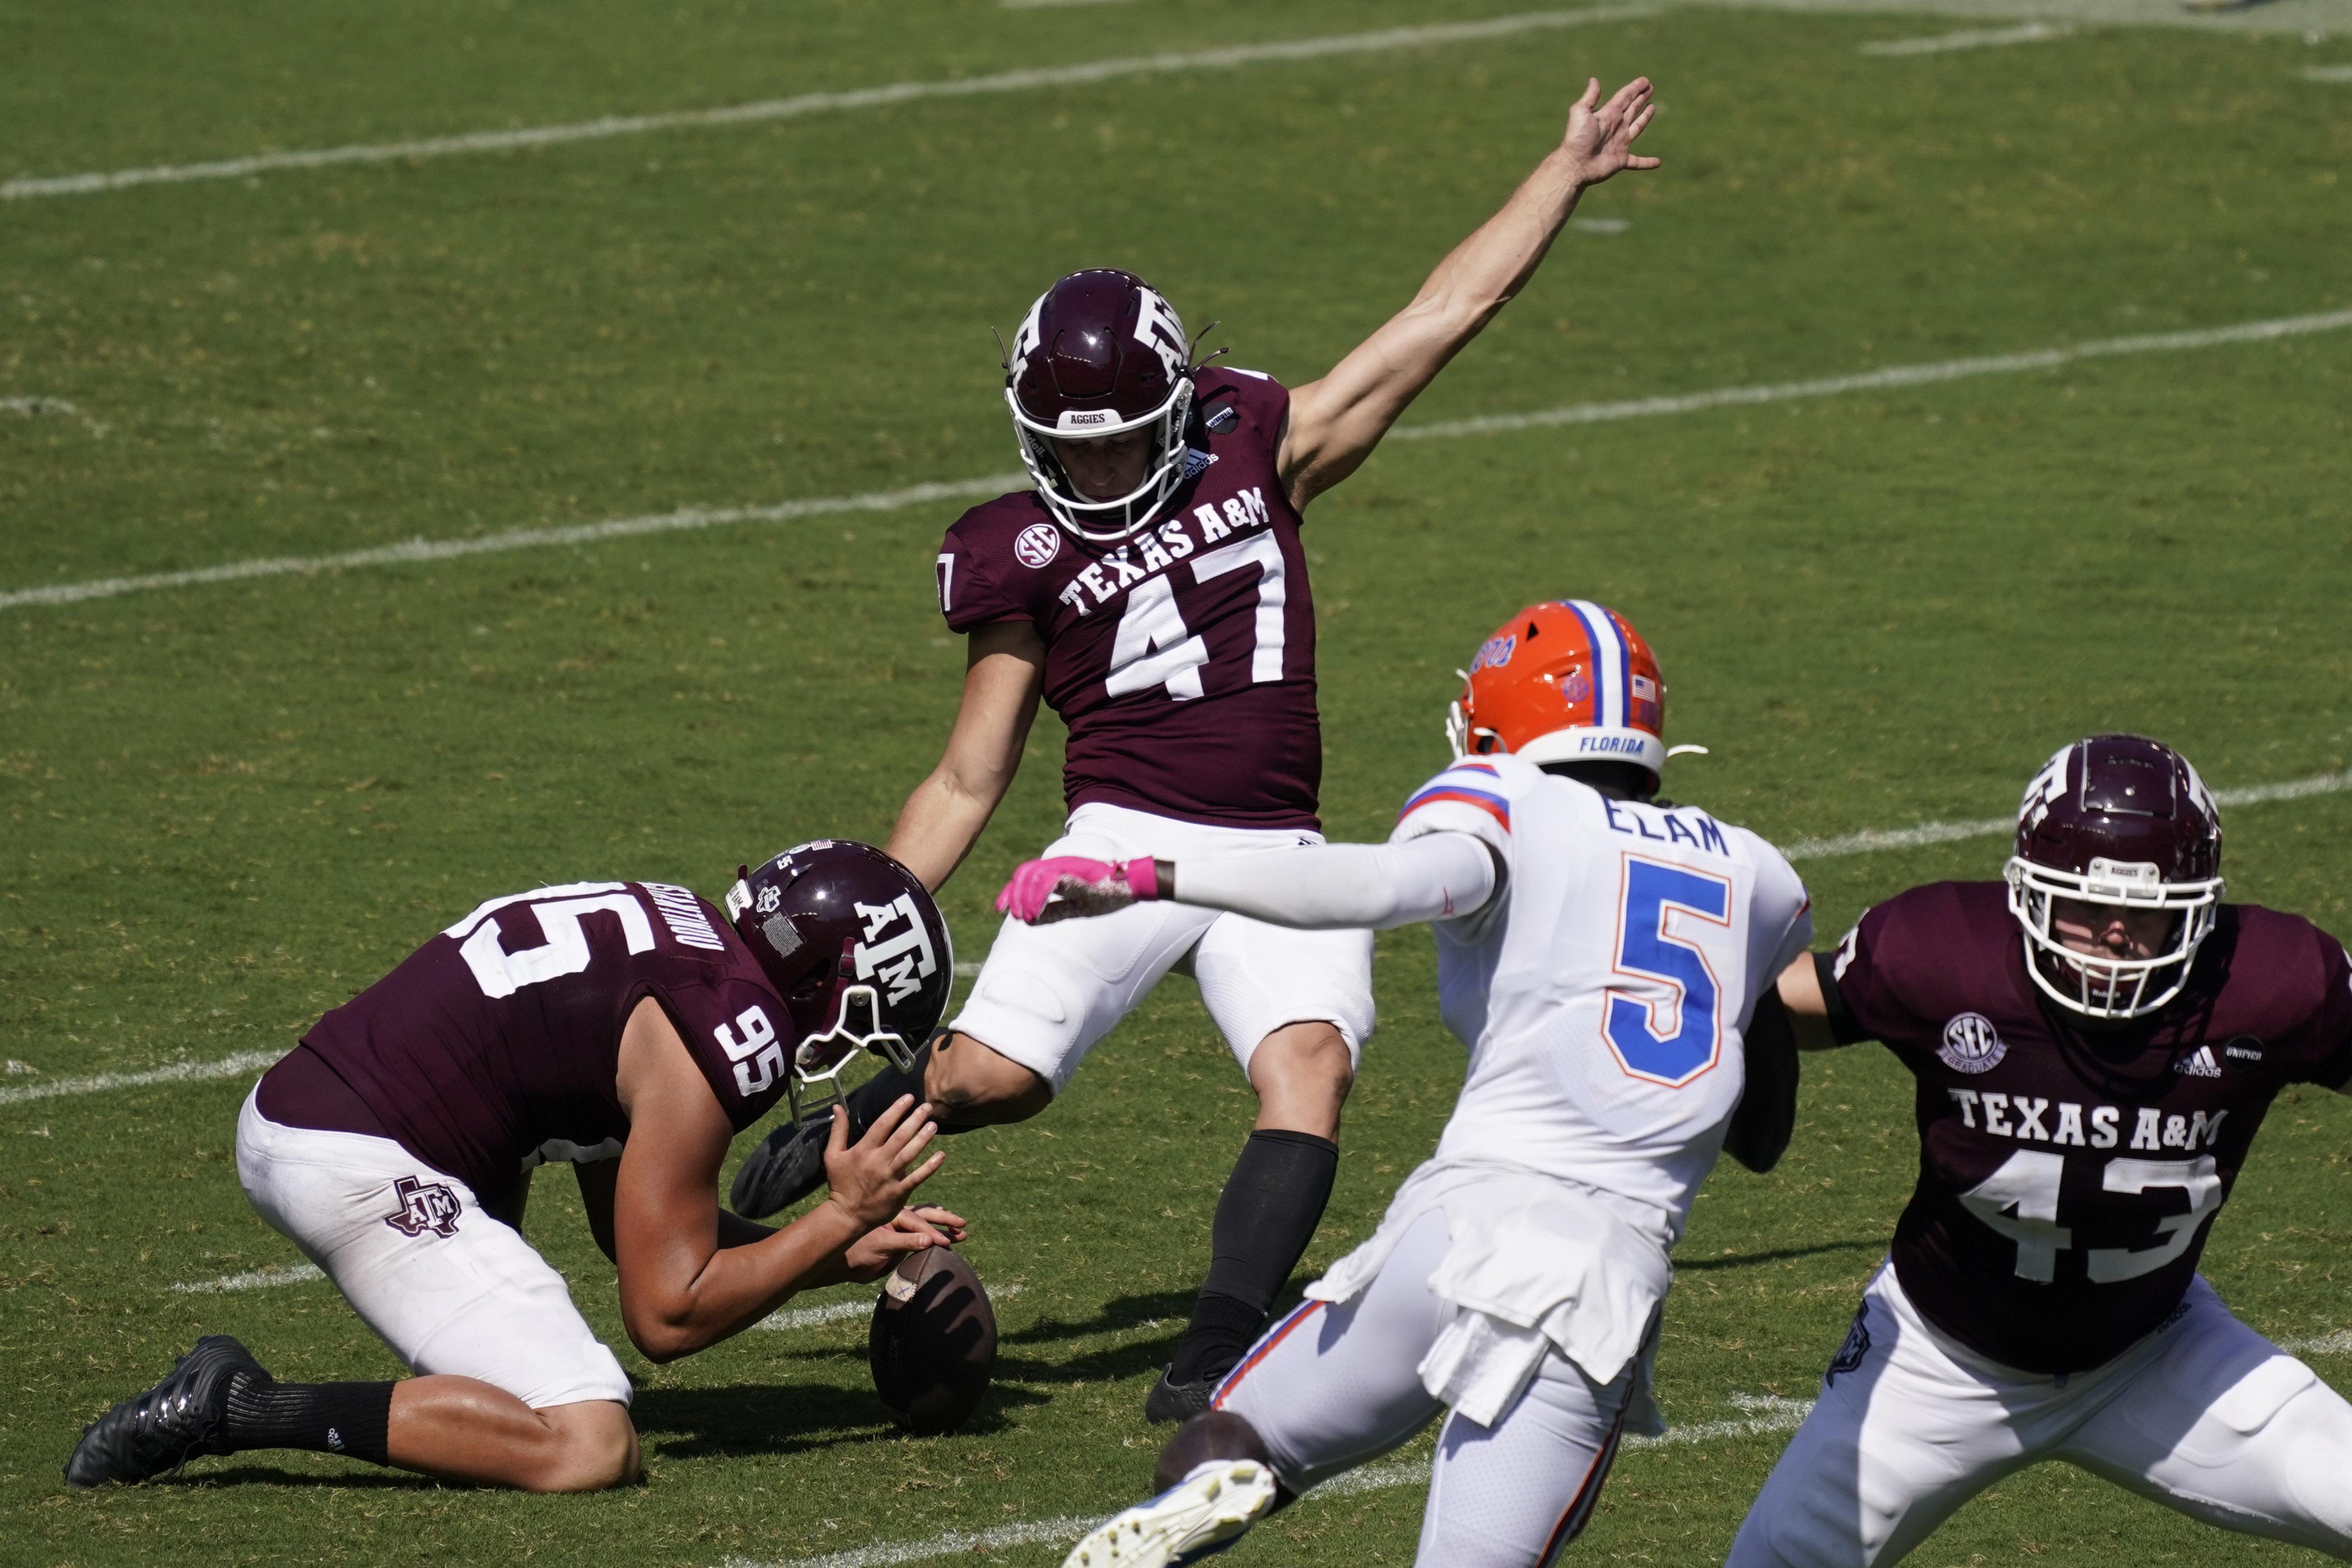 NCAA Football: Florida at Texas A&M